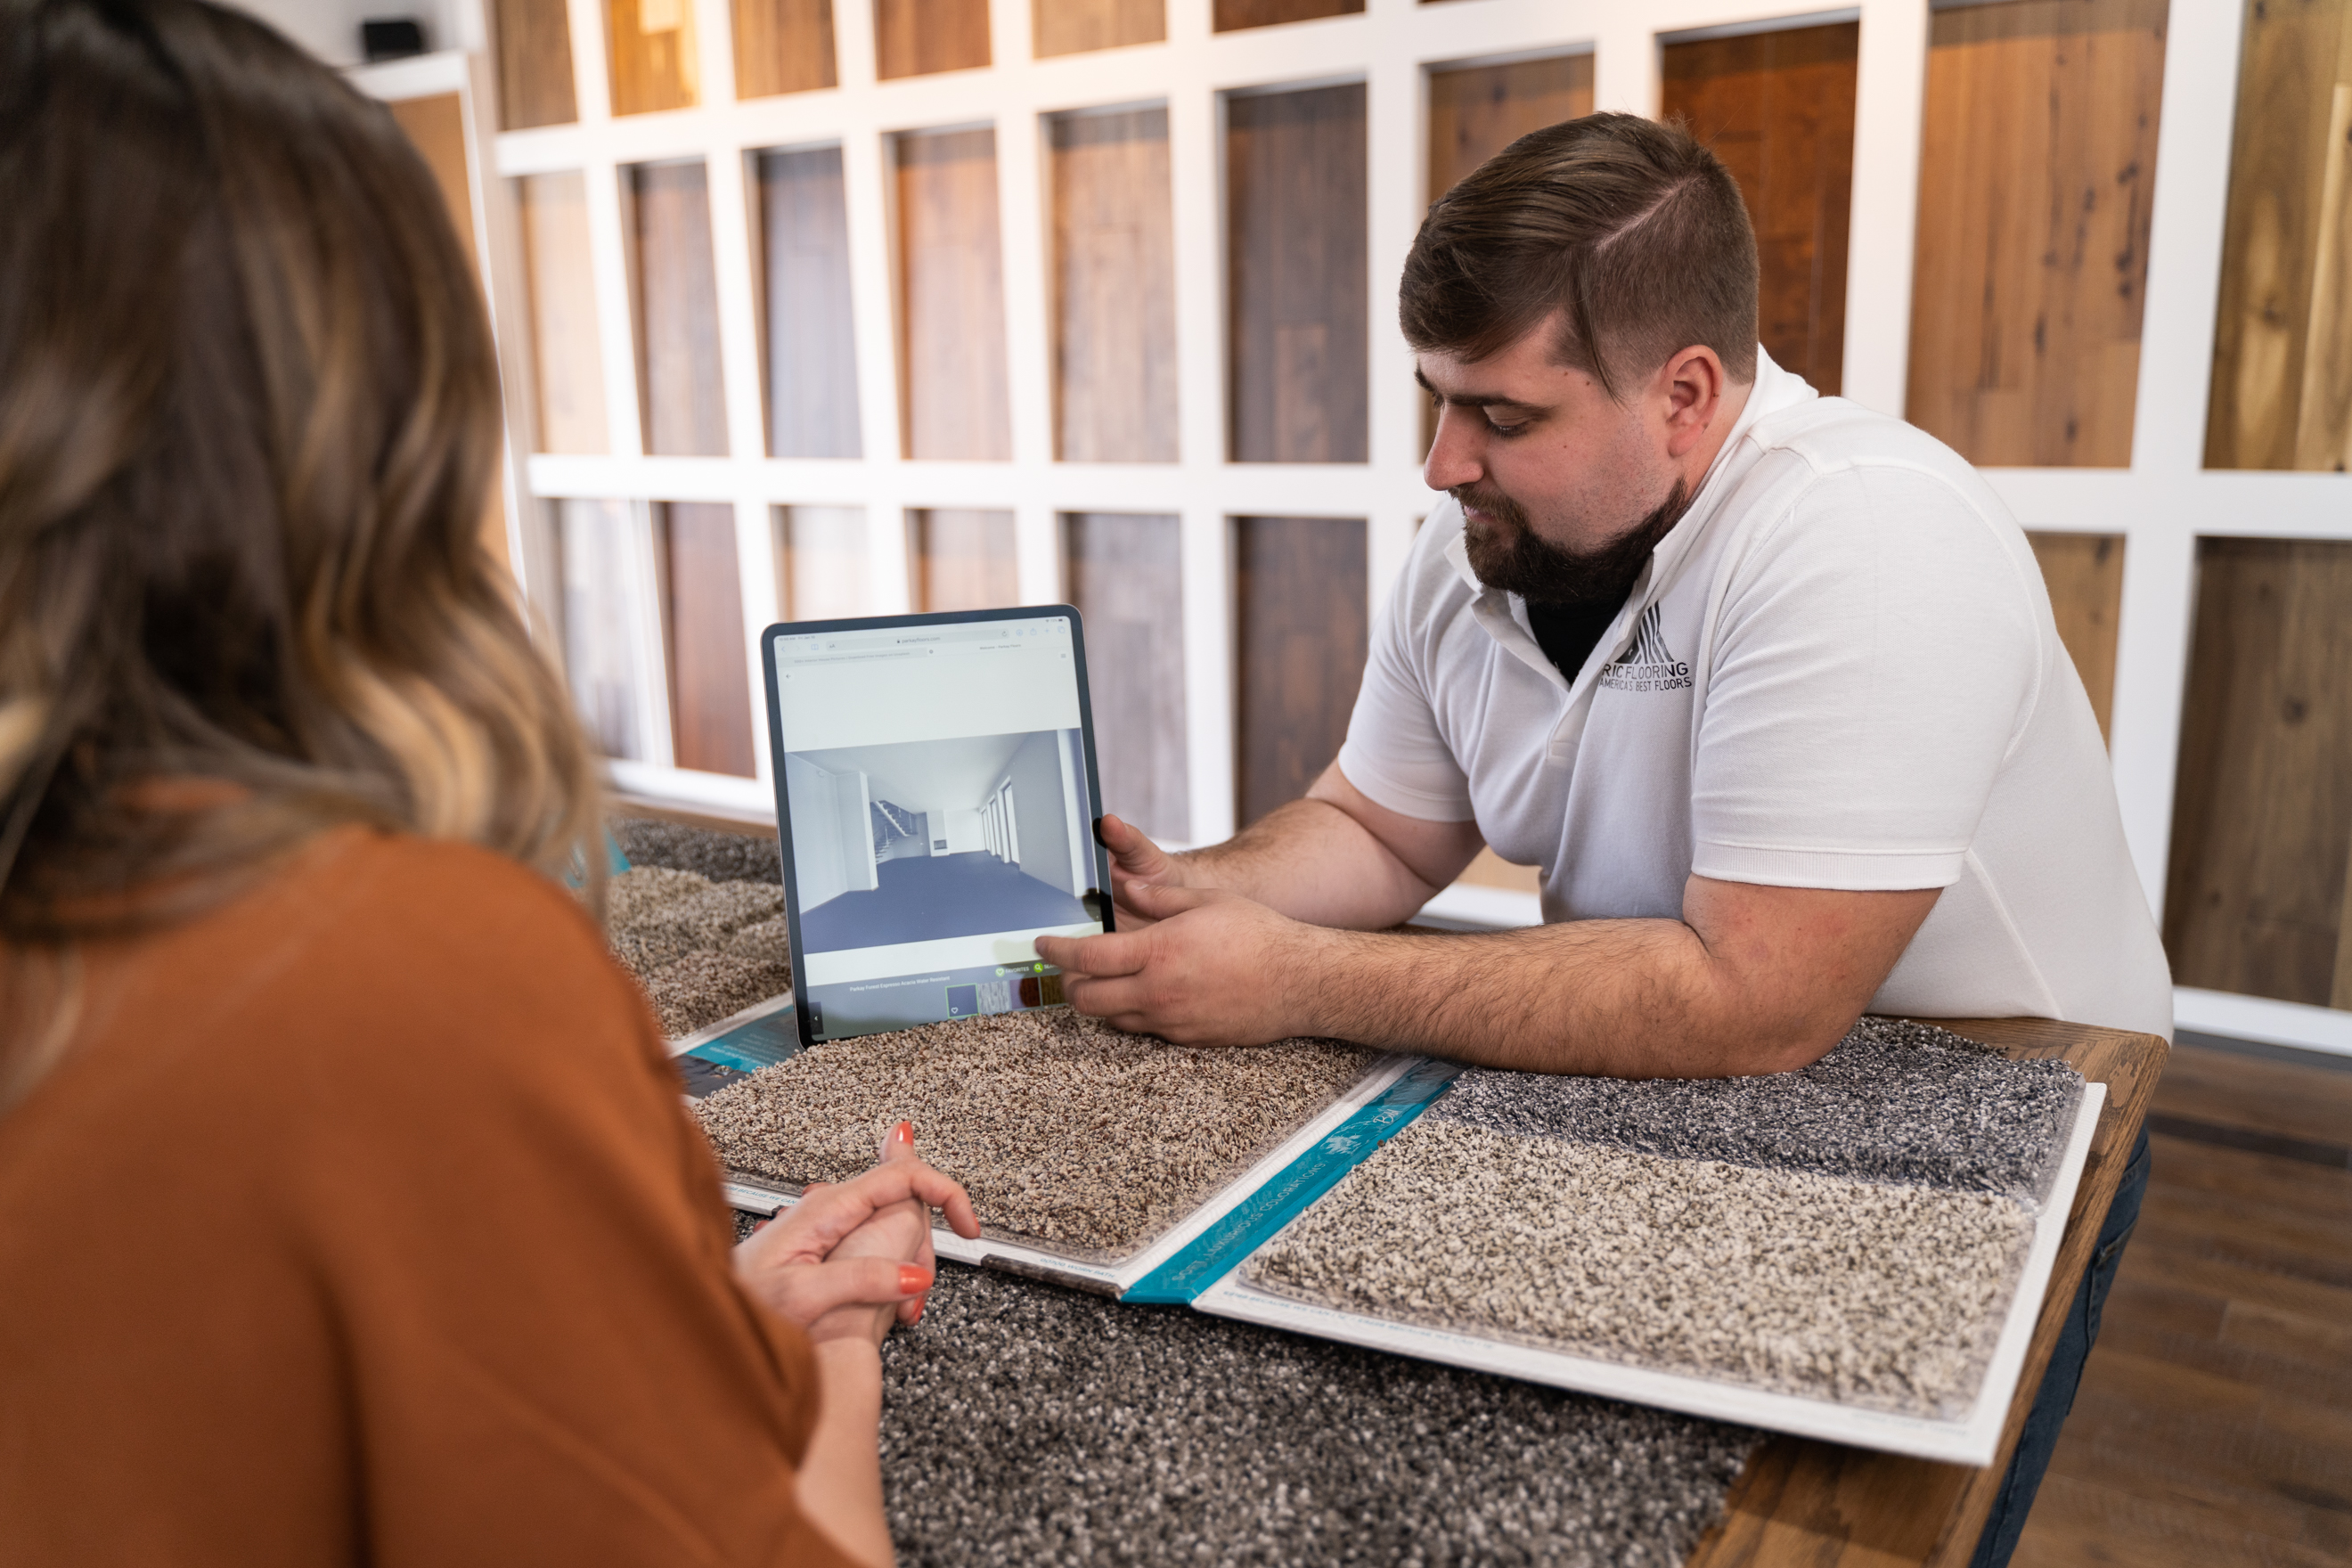 Veteran Achieves Business Dream of Opening Flooring Company